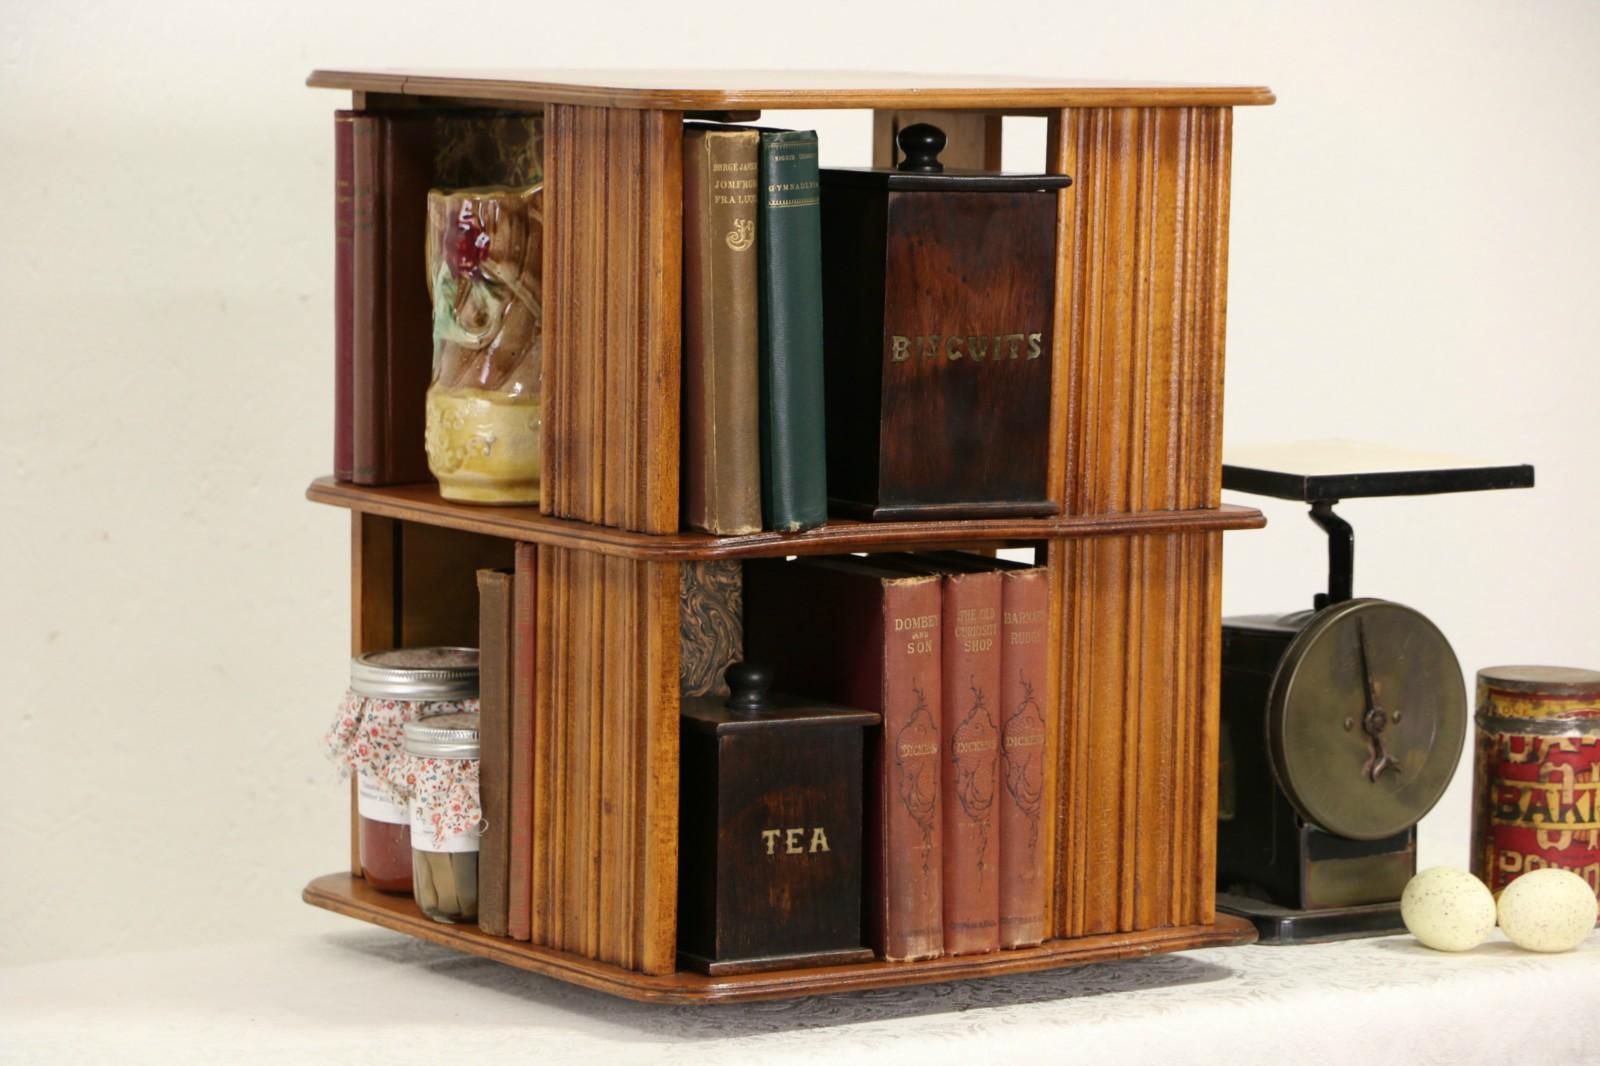 Spinning Bookcase, 1890u0027s Antique Chairside Or Tabletop Revolving Bookshelf  ...